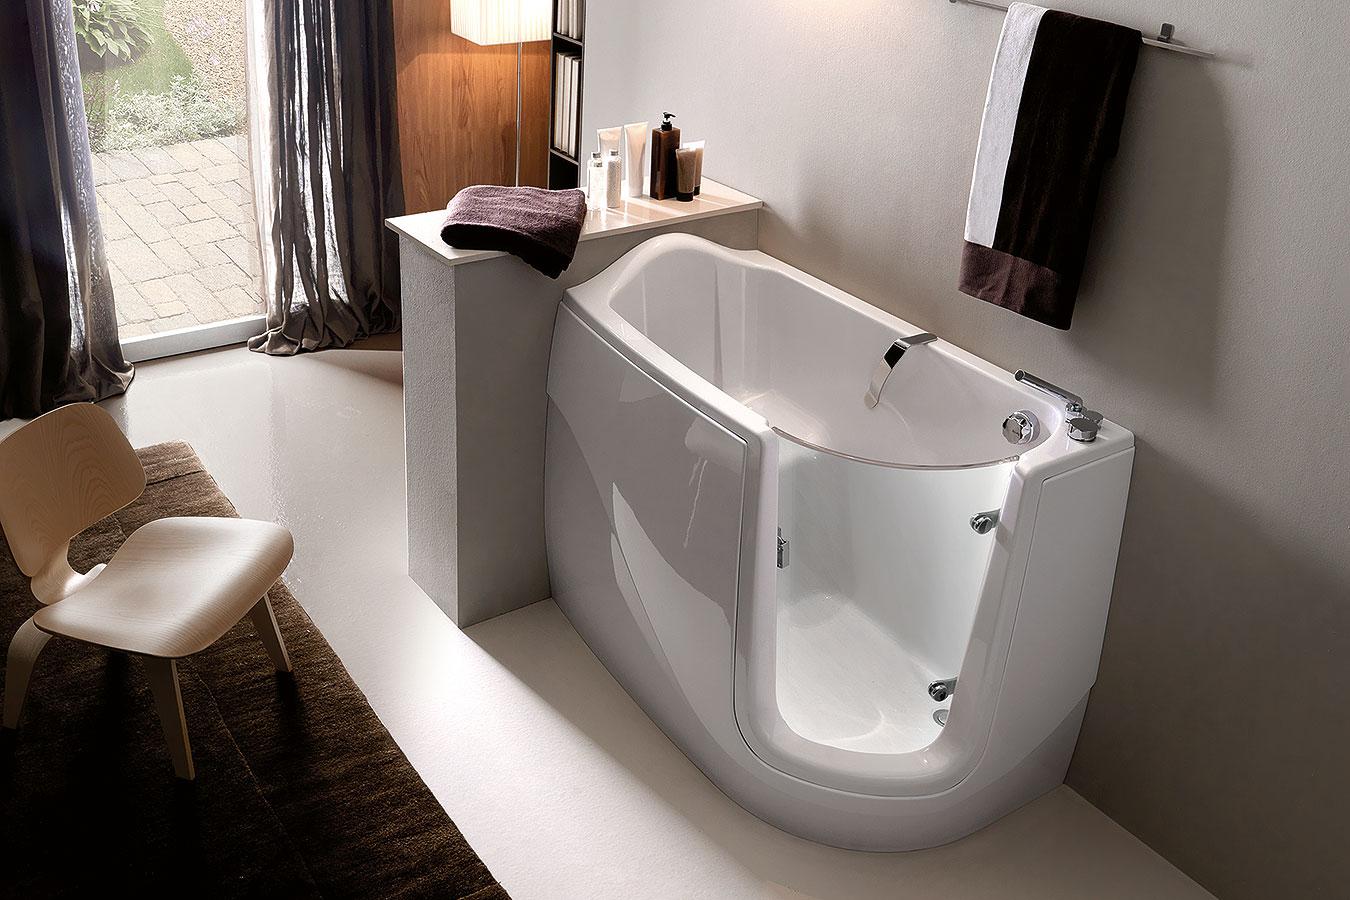 Coprifilo Angolare Vasca Da Bagno : Vasche da bagno treesse listino prezzi: vasca da bagno doccia